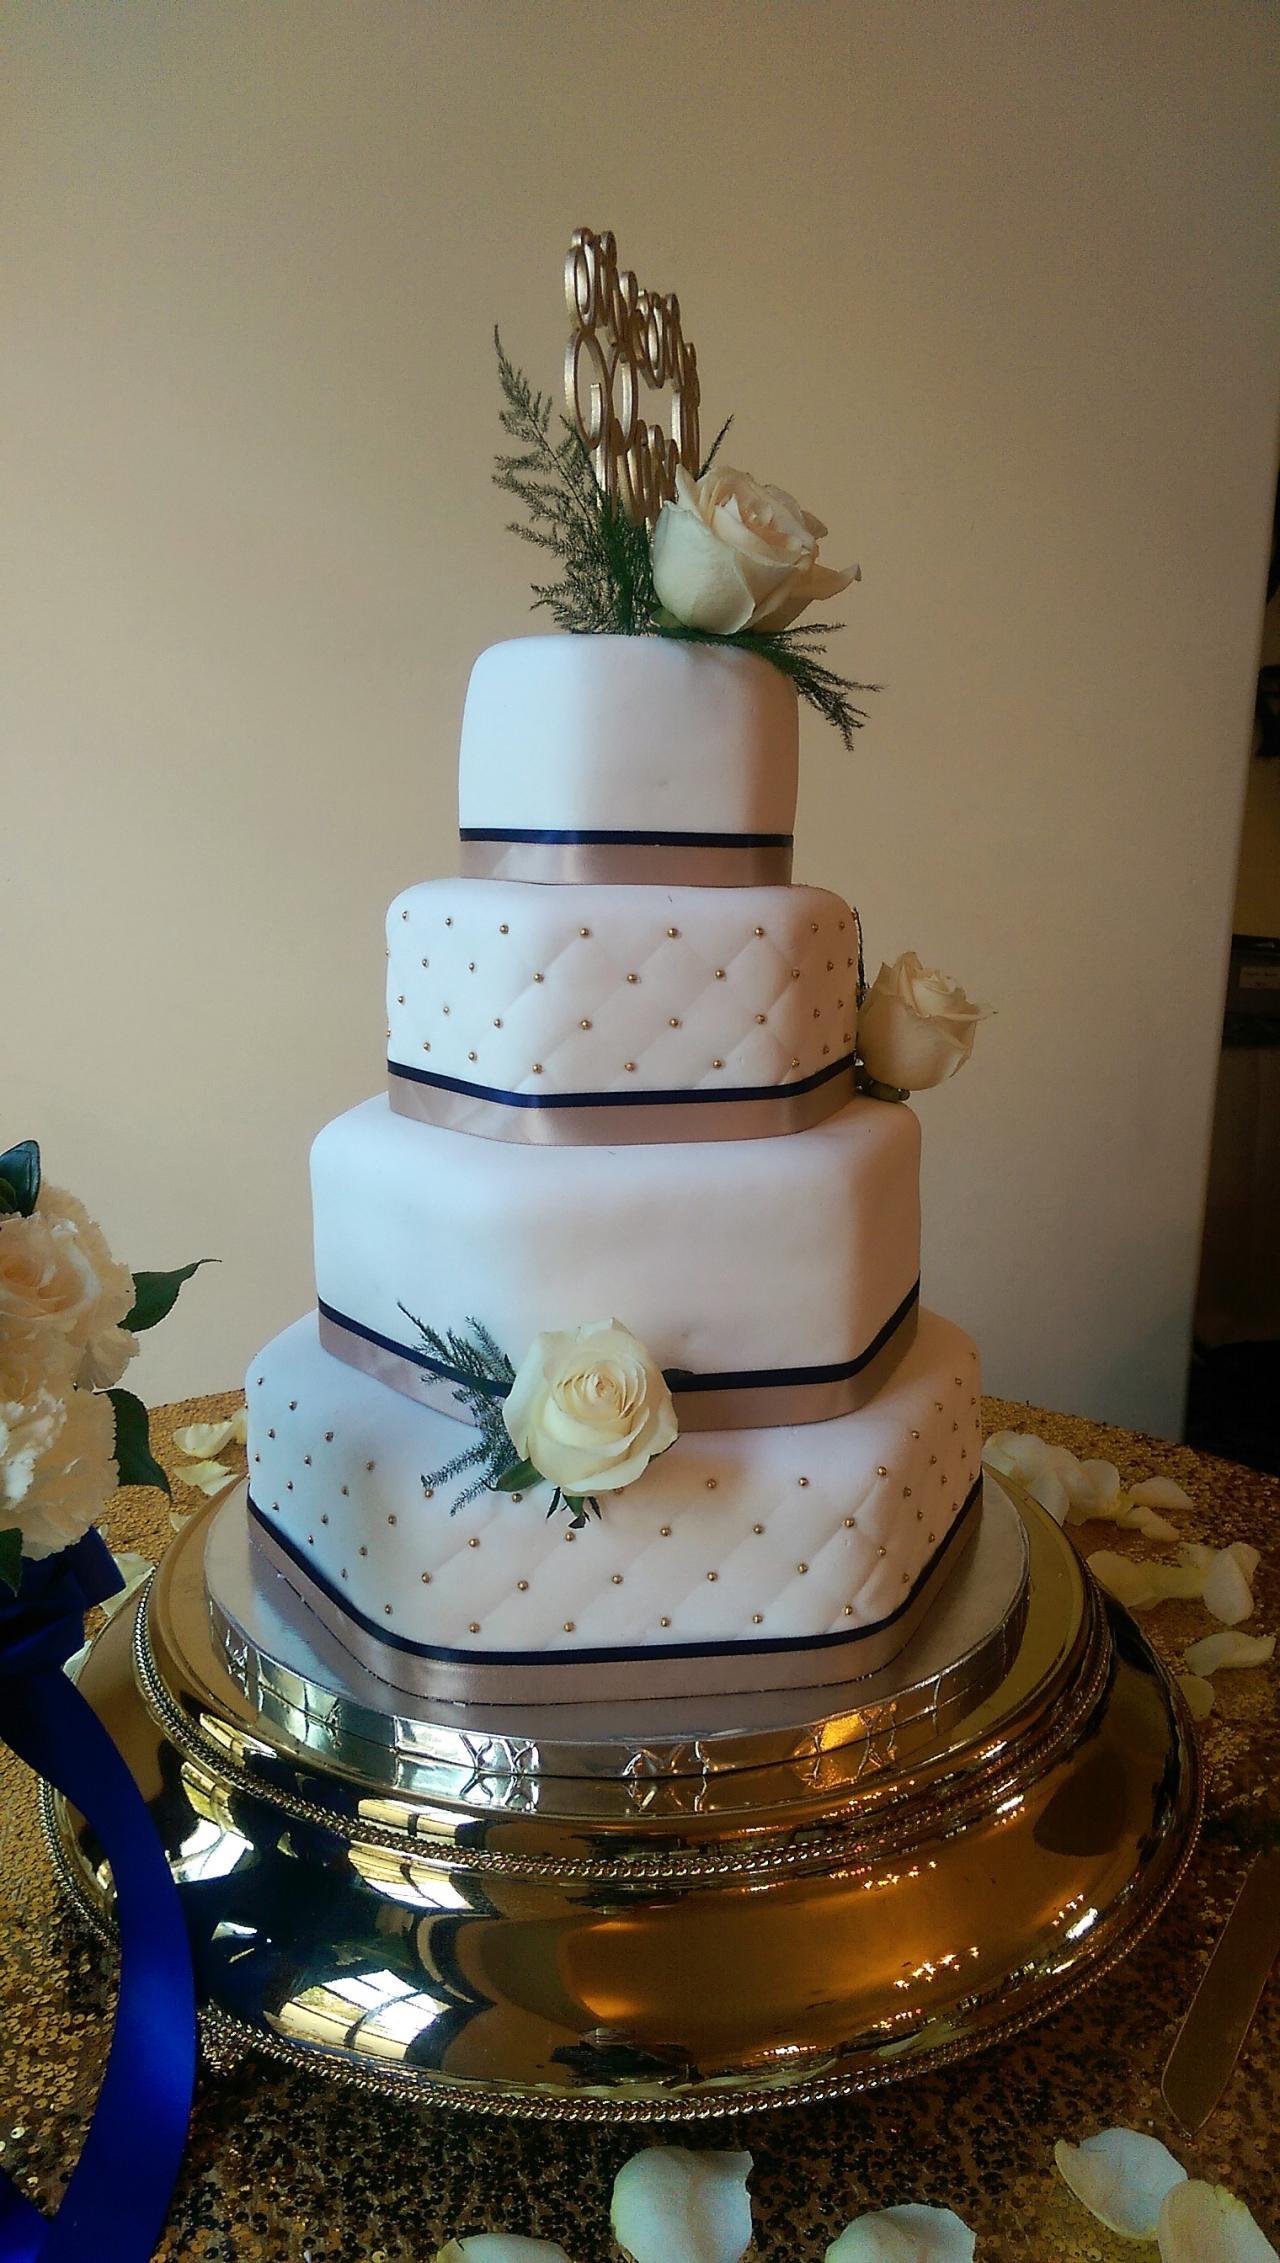 Wedding Cakes Galleries  My Goodness Cakes Wedding Cake Gallery 2